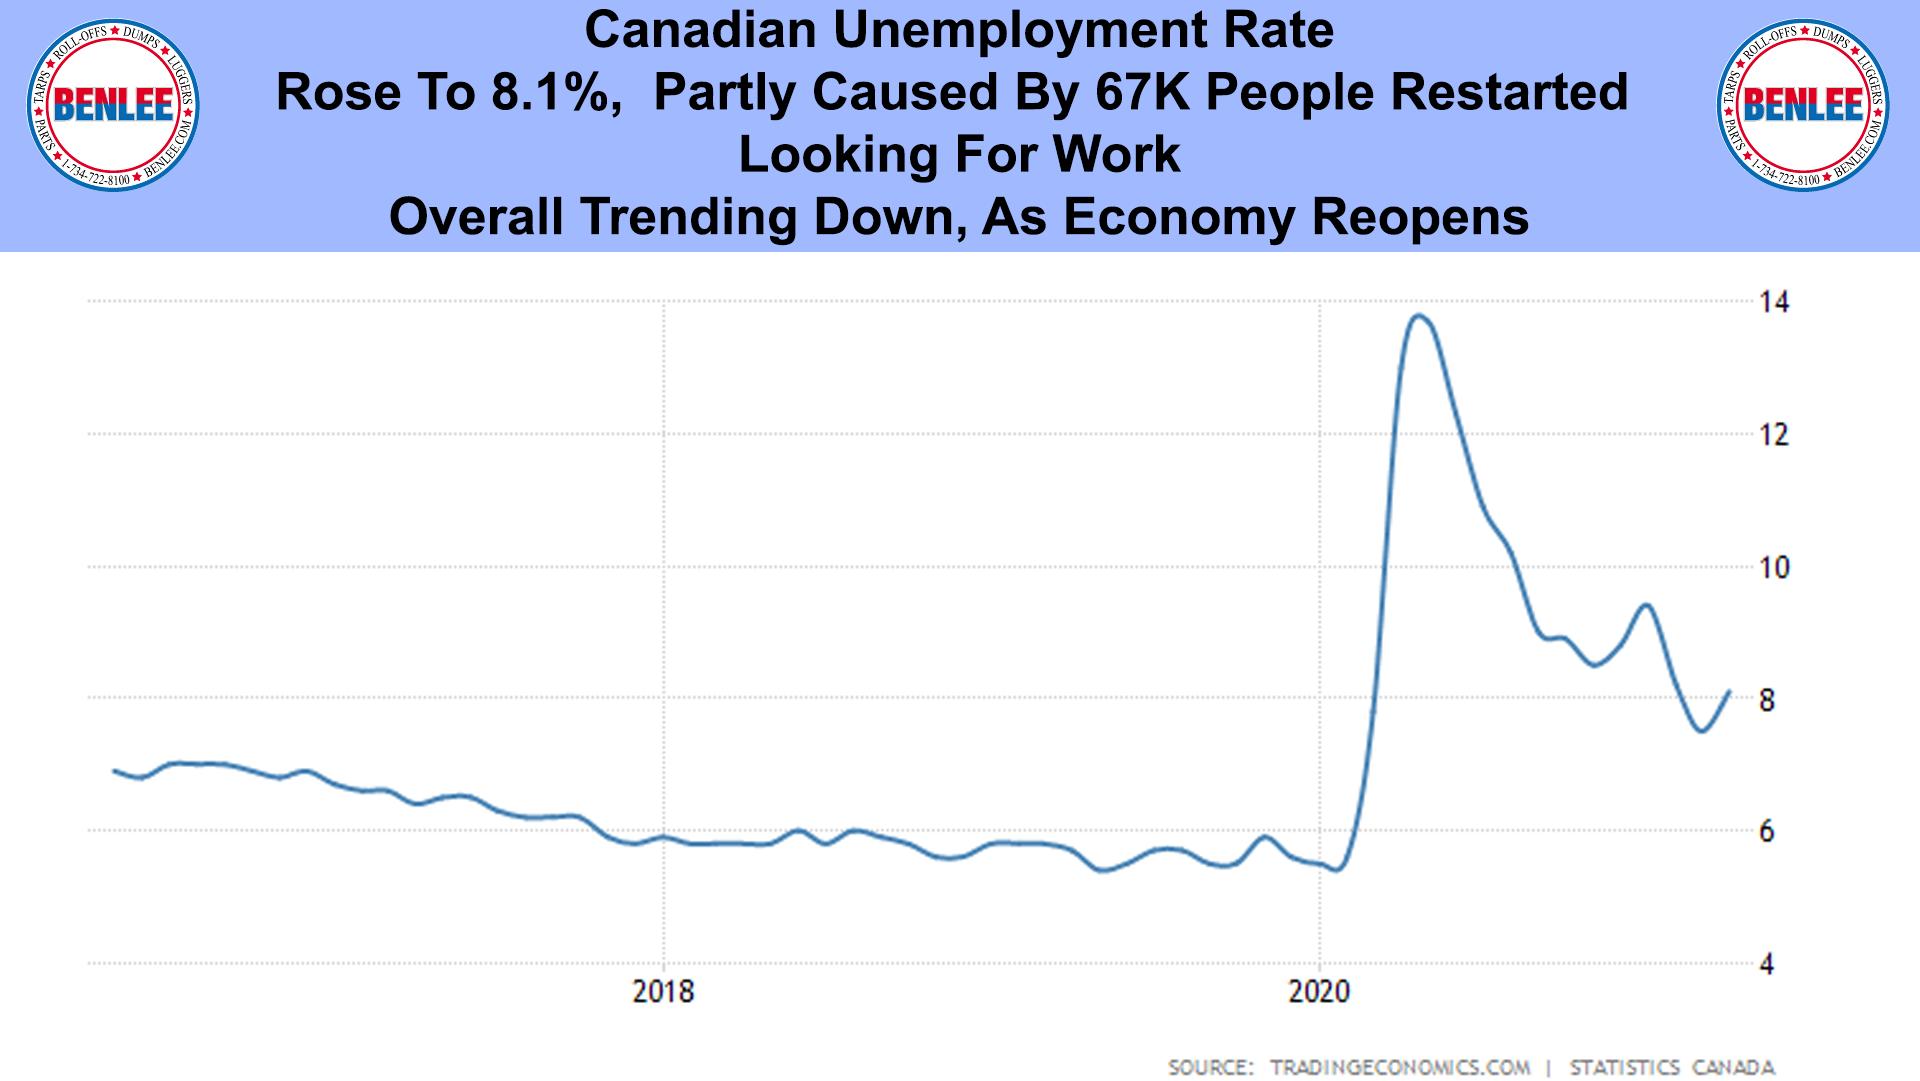 Canadian Unemployment Rate